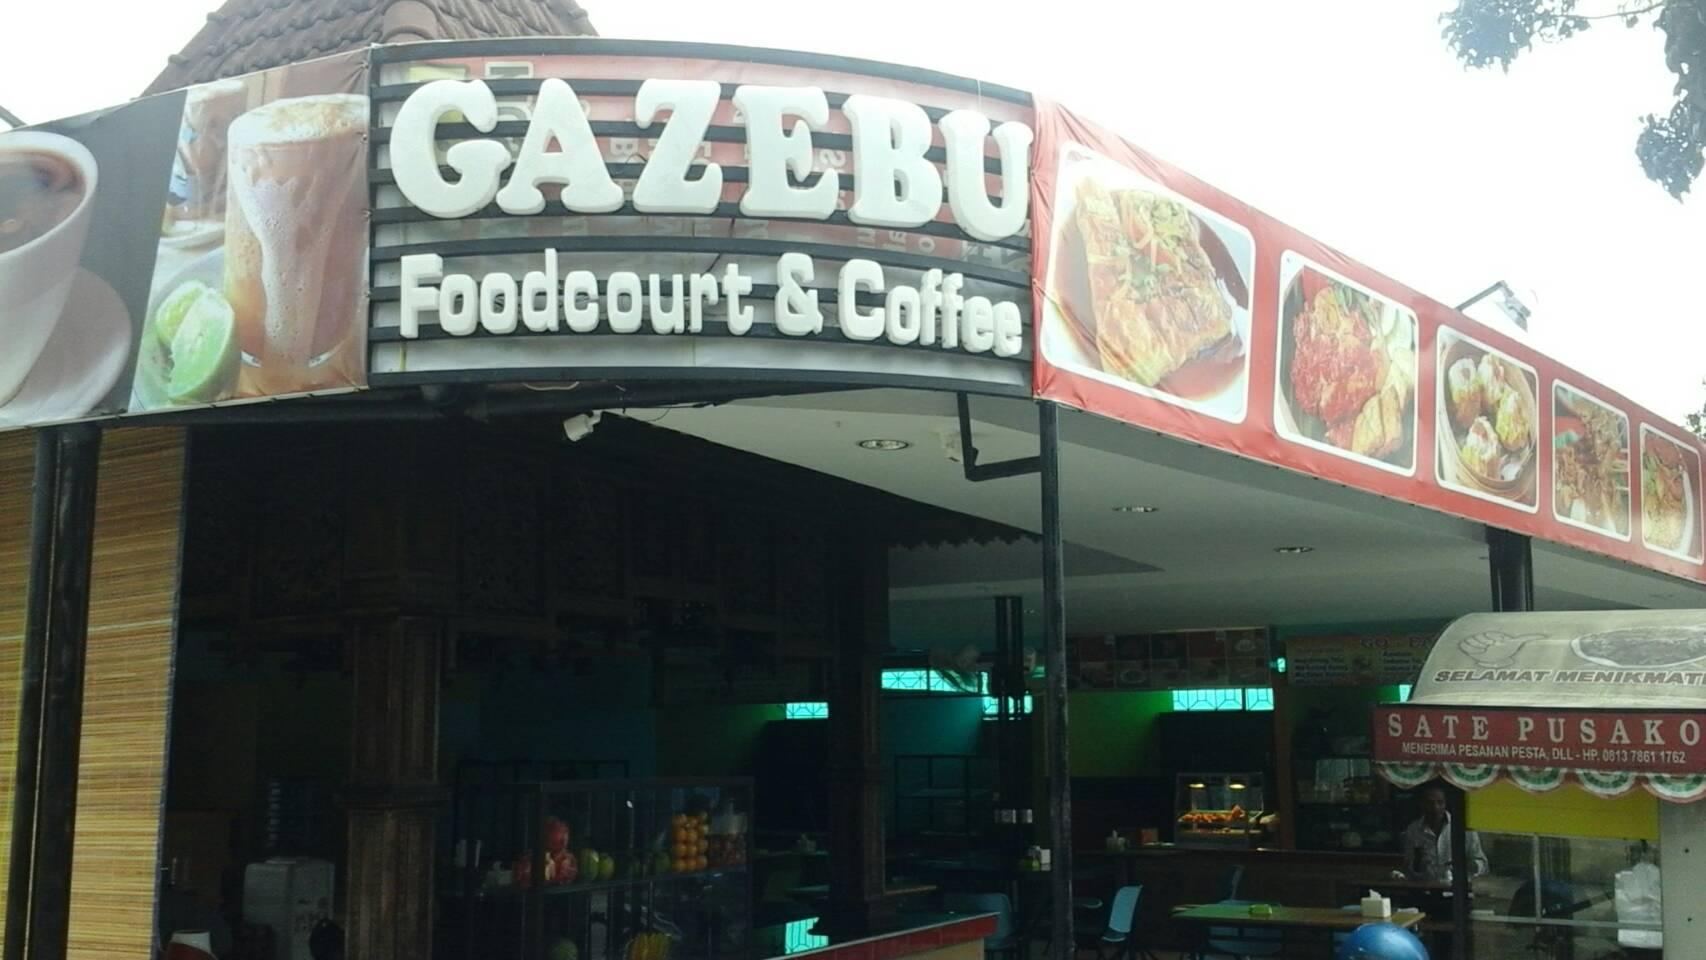 1504062129540 - Usaha Foodcourt And Coffee, Tempat Nongkrong Pekanbaru